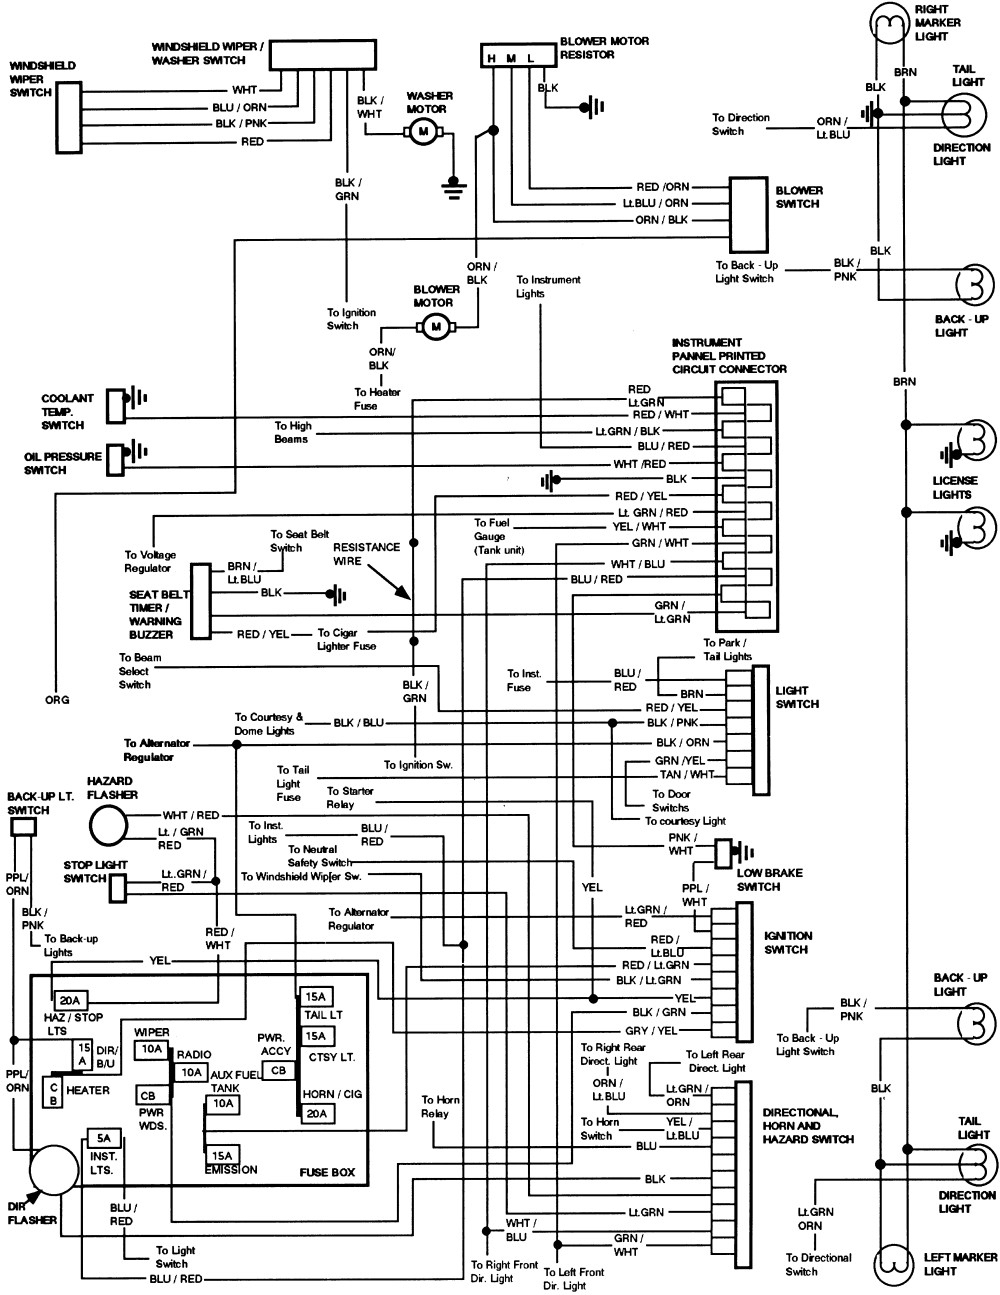 2011 F350 Trailer Wiring Diagram